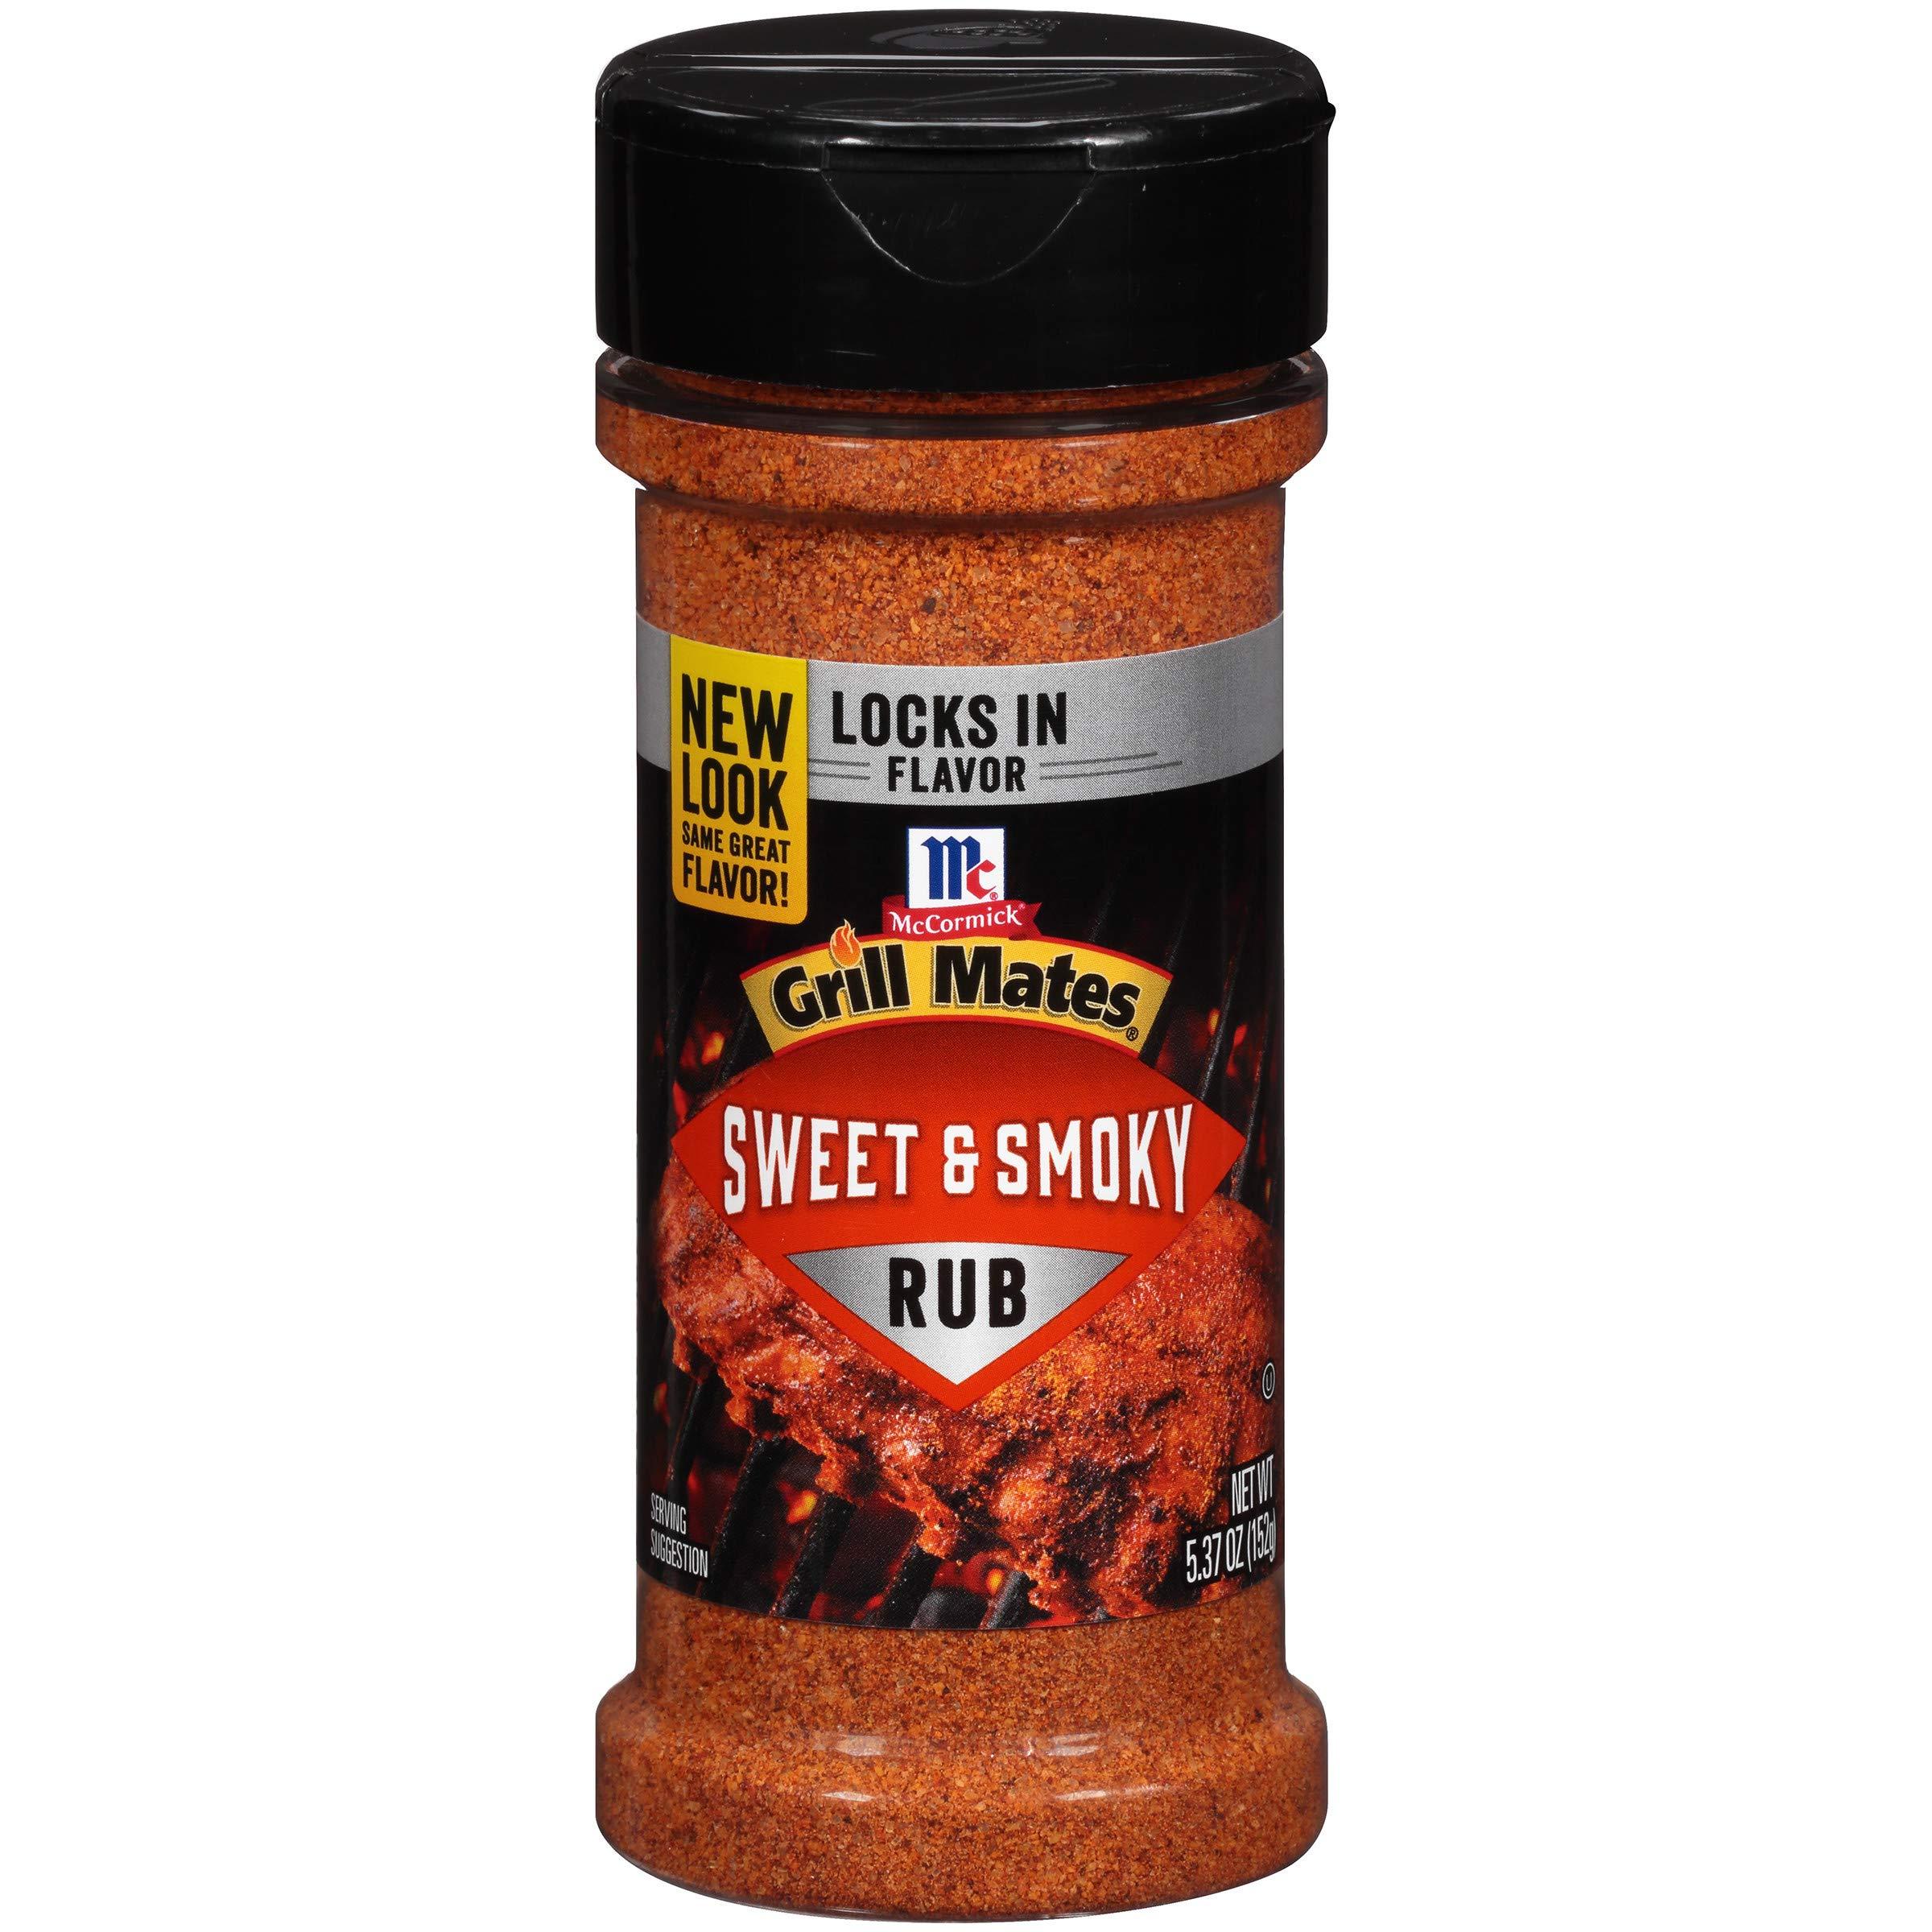 McCormick Grill Mates Sweet & Smoky Dry Rub, 5.37 OZ